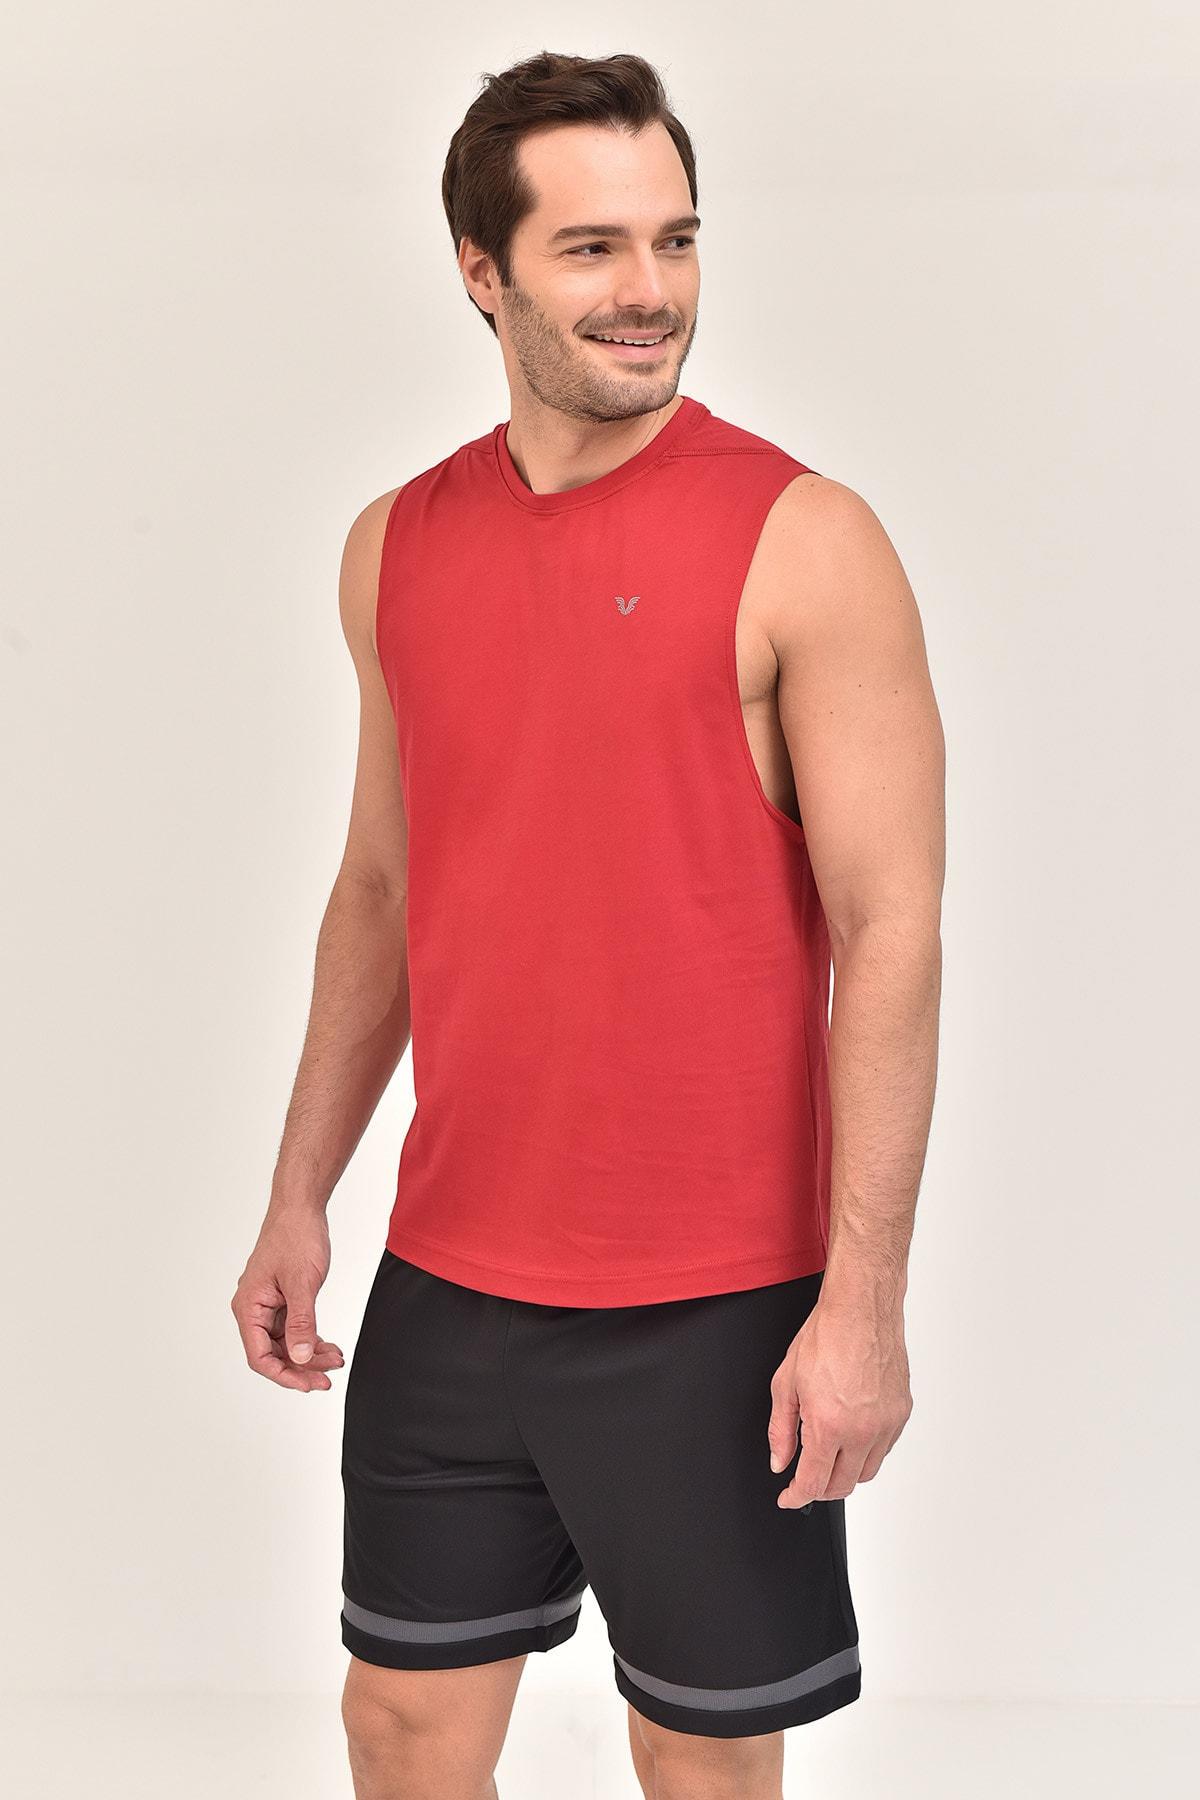 bilcee Bordo Pamuklu Erkek Atlet Fs-1622 1